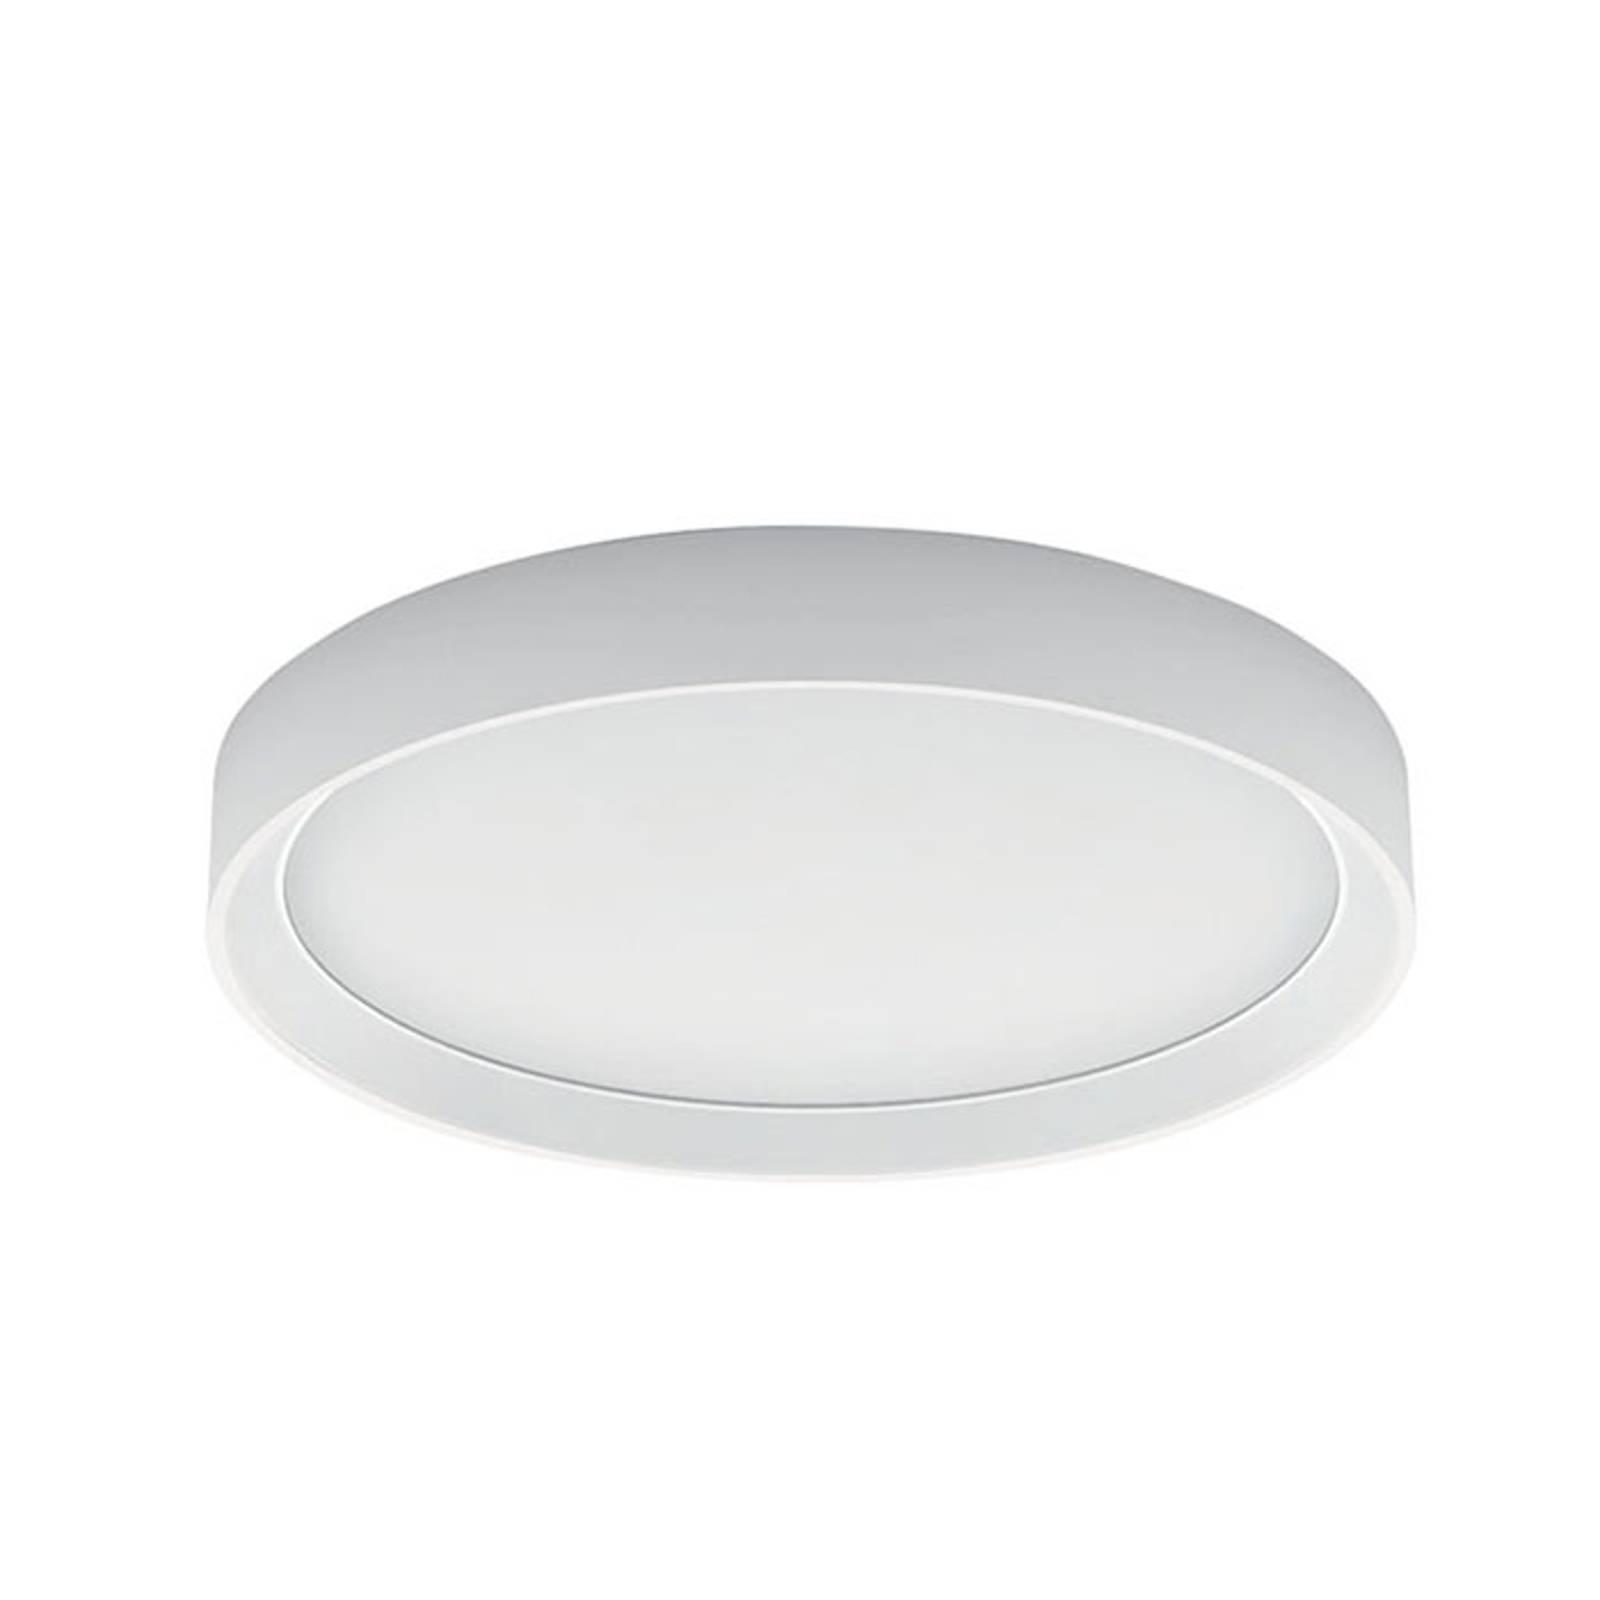 LED-kattovalaisin Tara R, pyöreä, Ø 41 cm